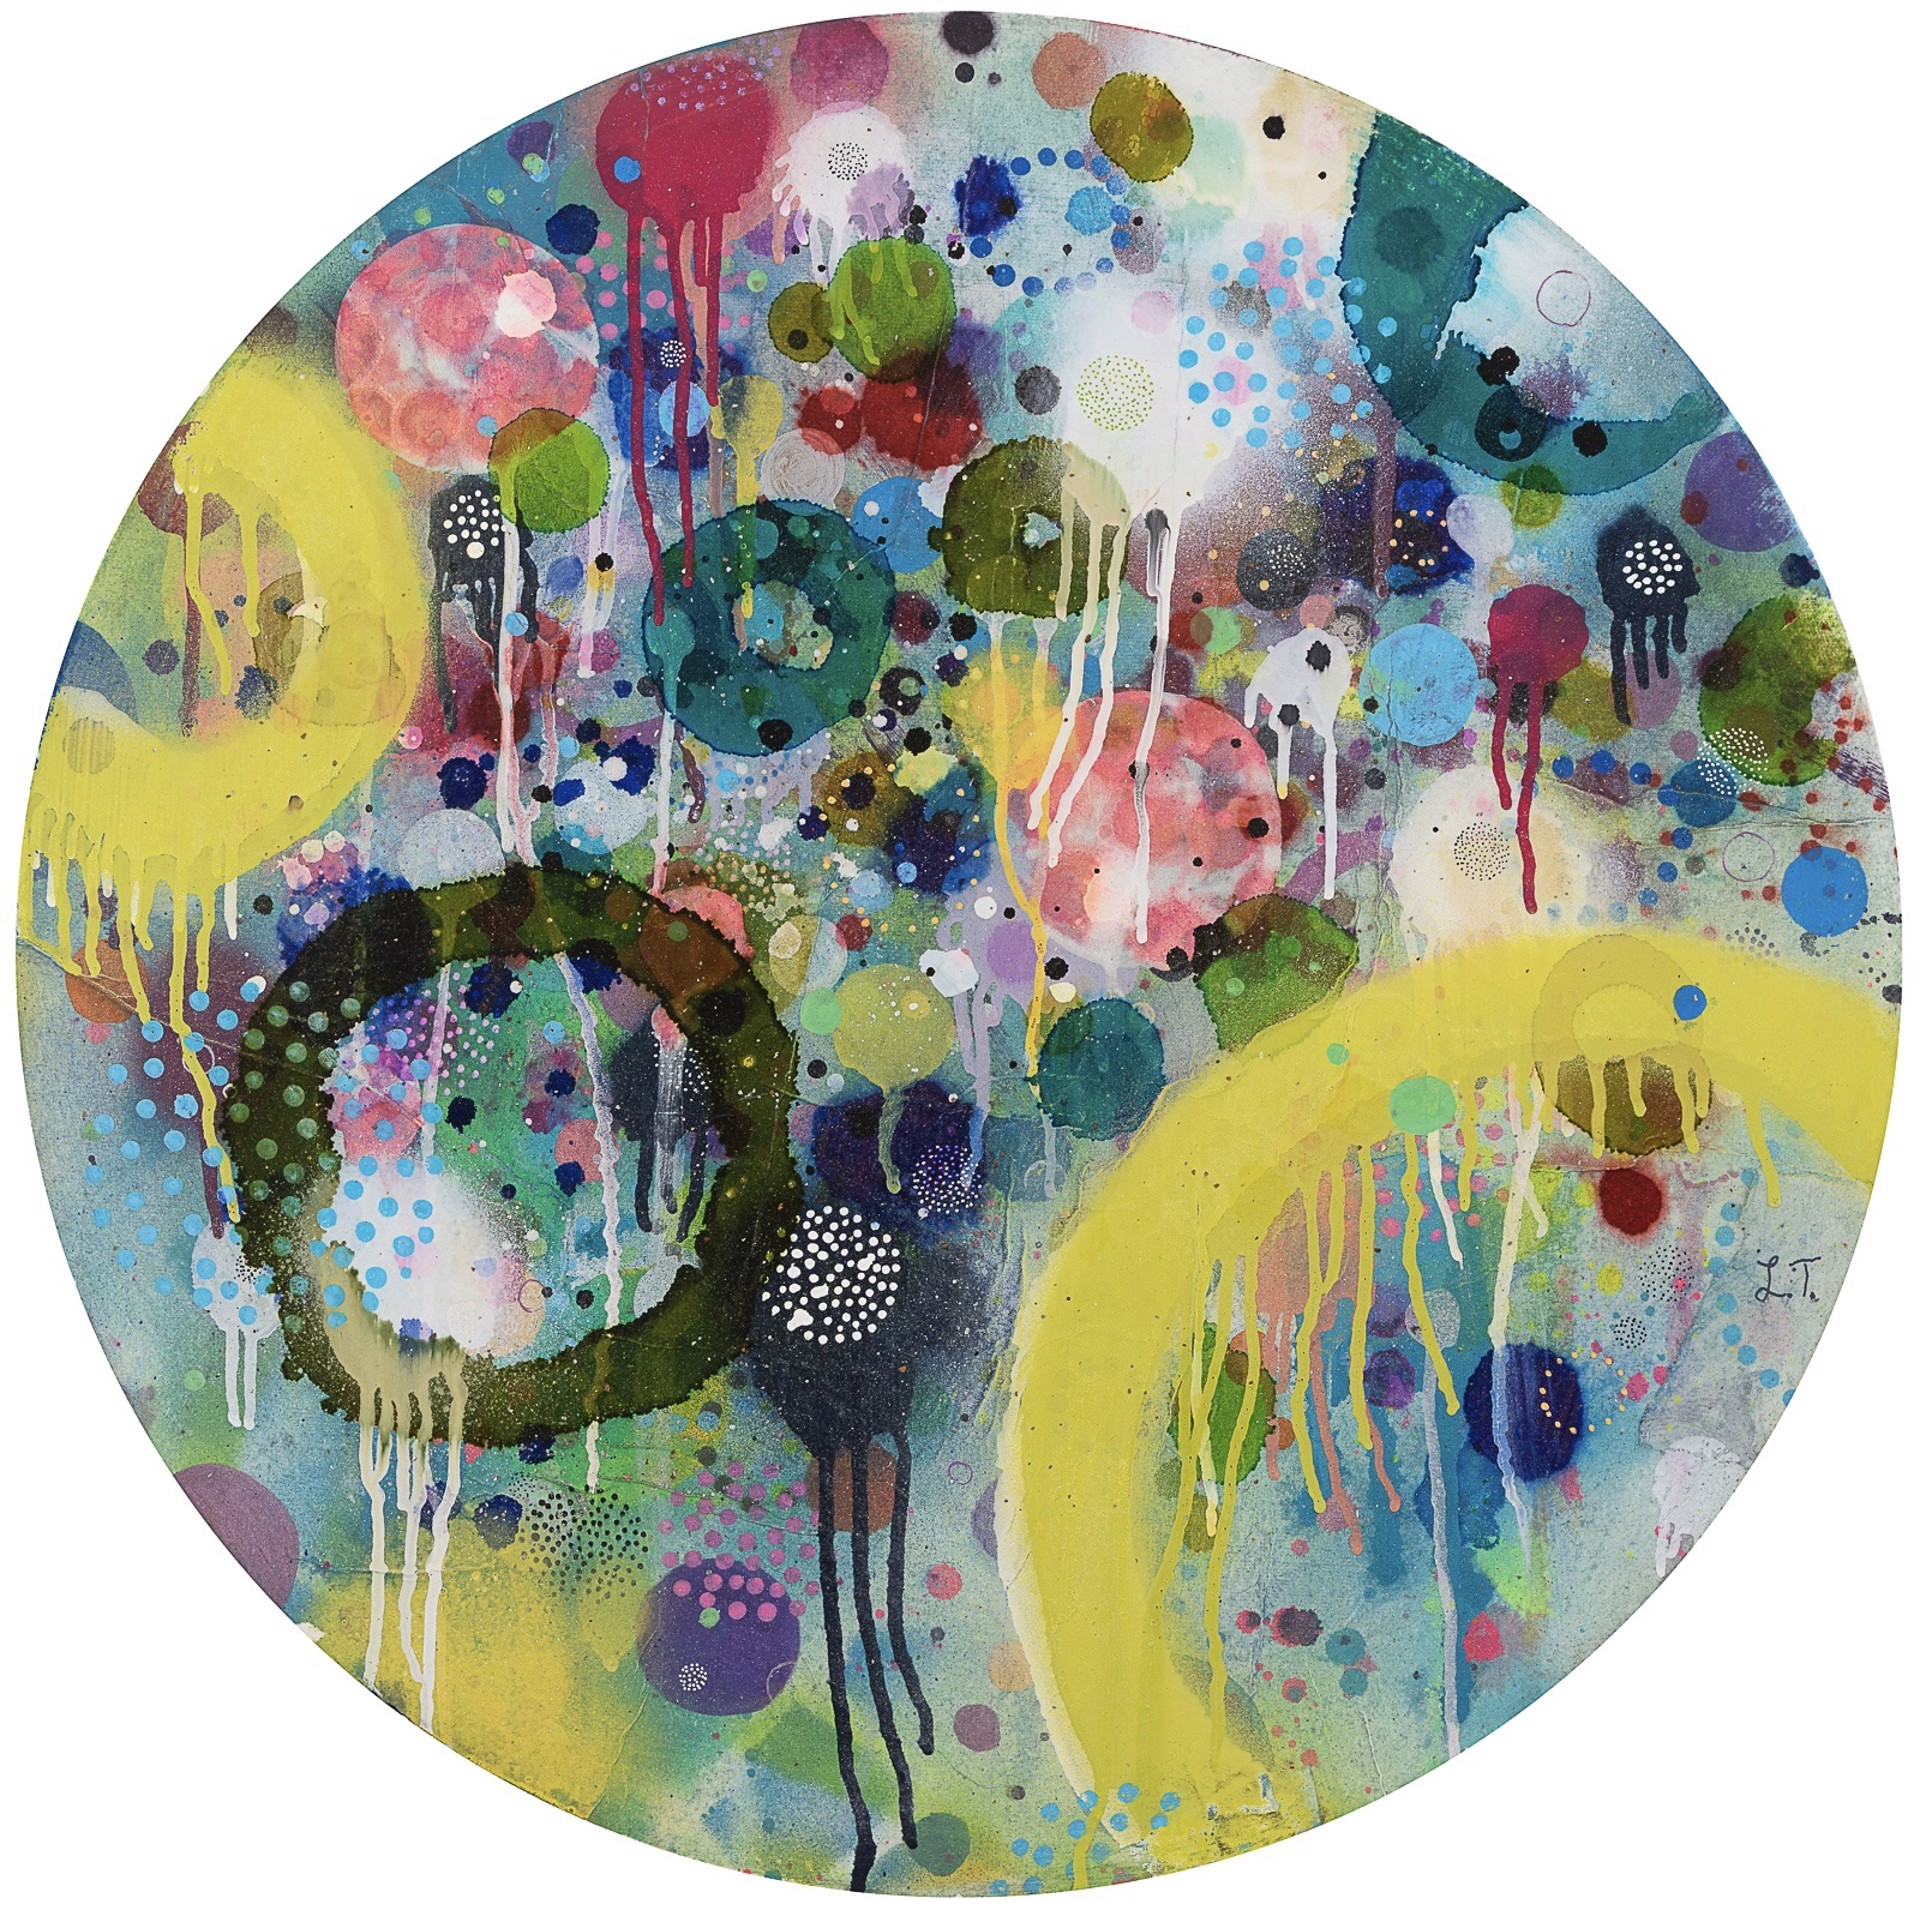 Cosmic Circle 1 by Liz Tran